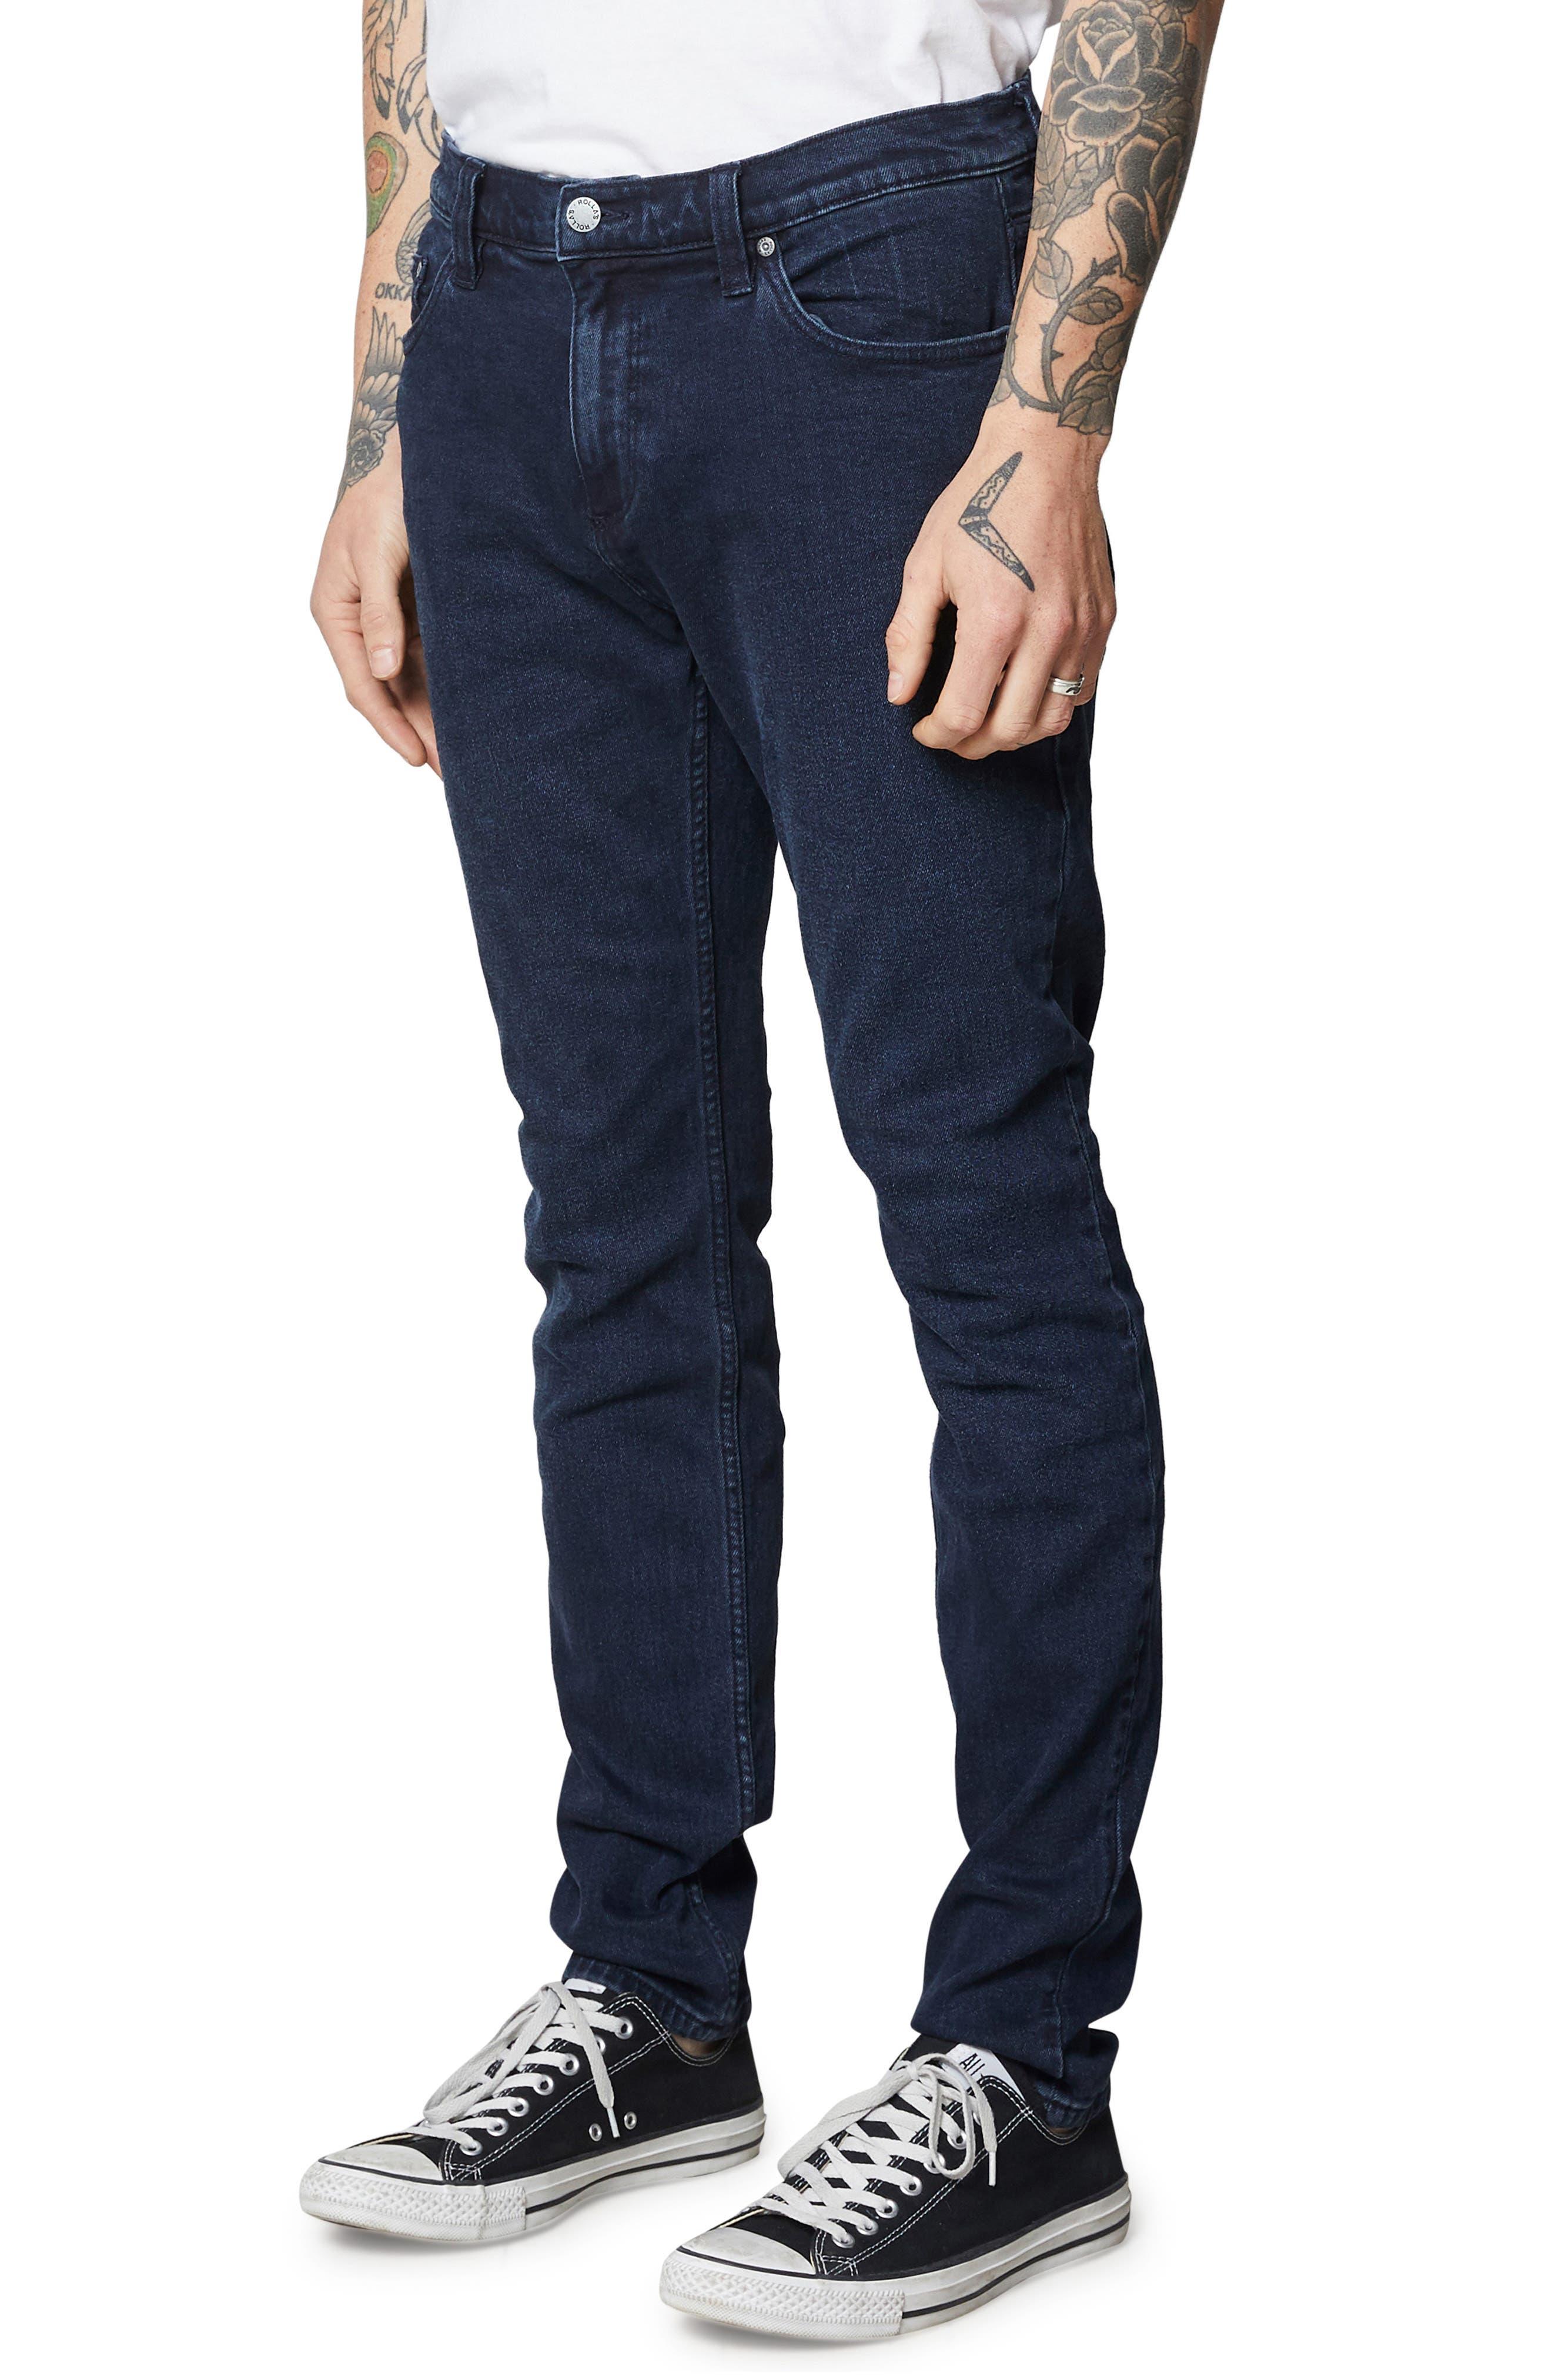 Stinger Skinny Fit Jeans,                             Alternate thumbnail 3, color,                             STONE FREE BLACK